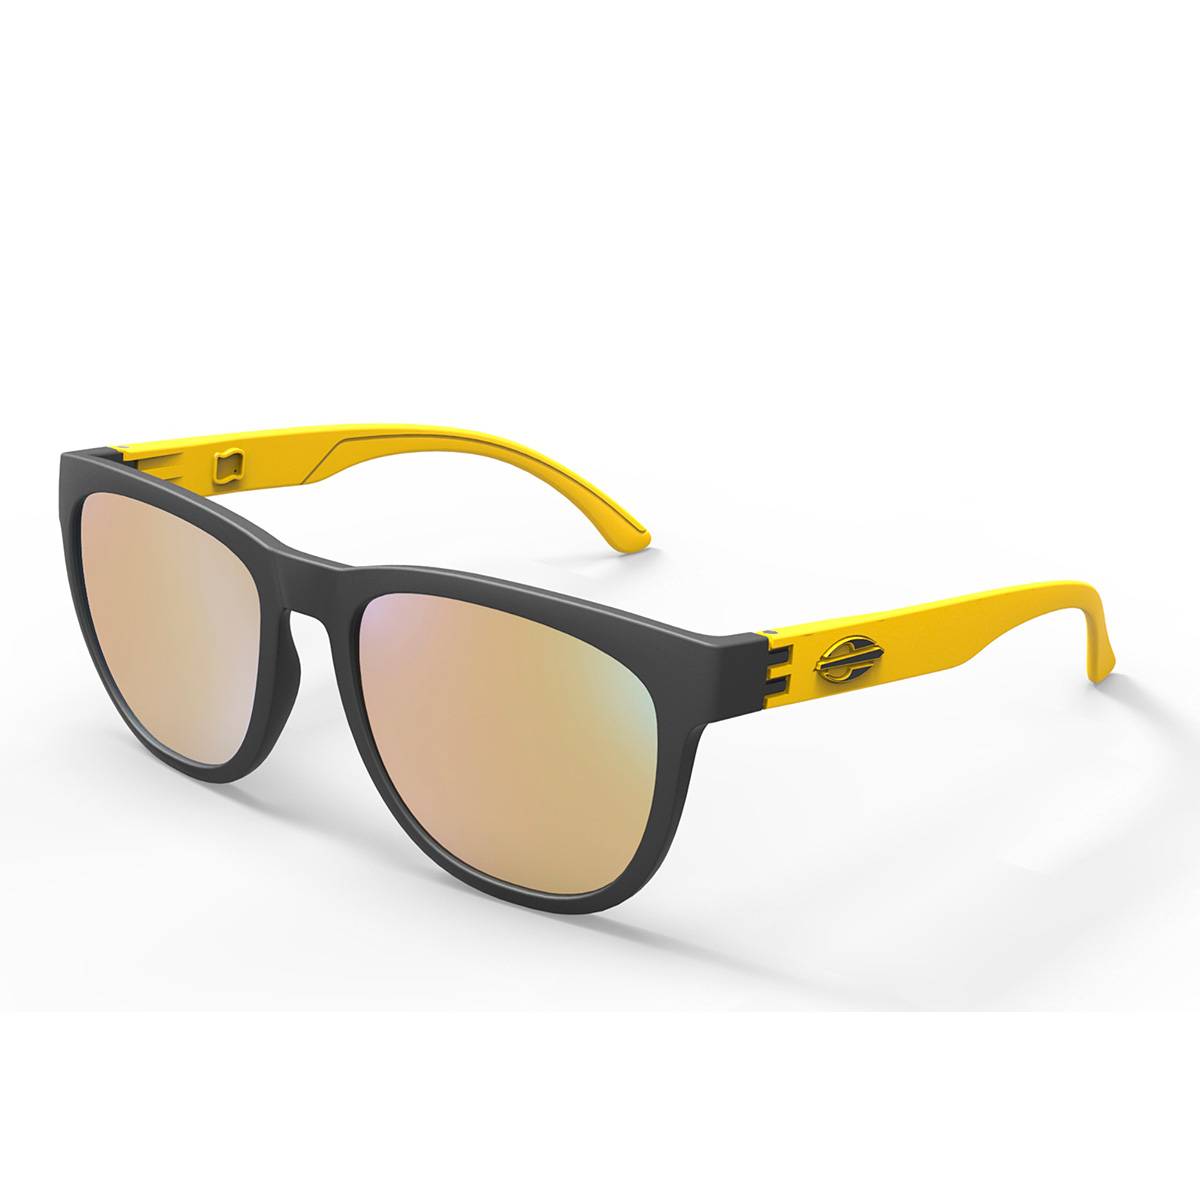 Óculos de Sol Mormaii Santa Cruz M0030A8396MormaiiMormaii de ... 5815a39a16